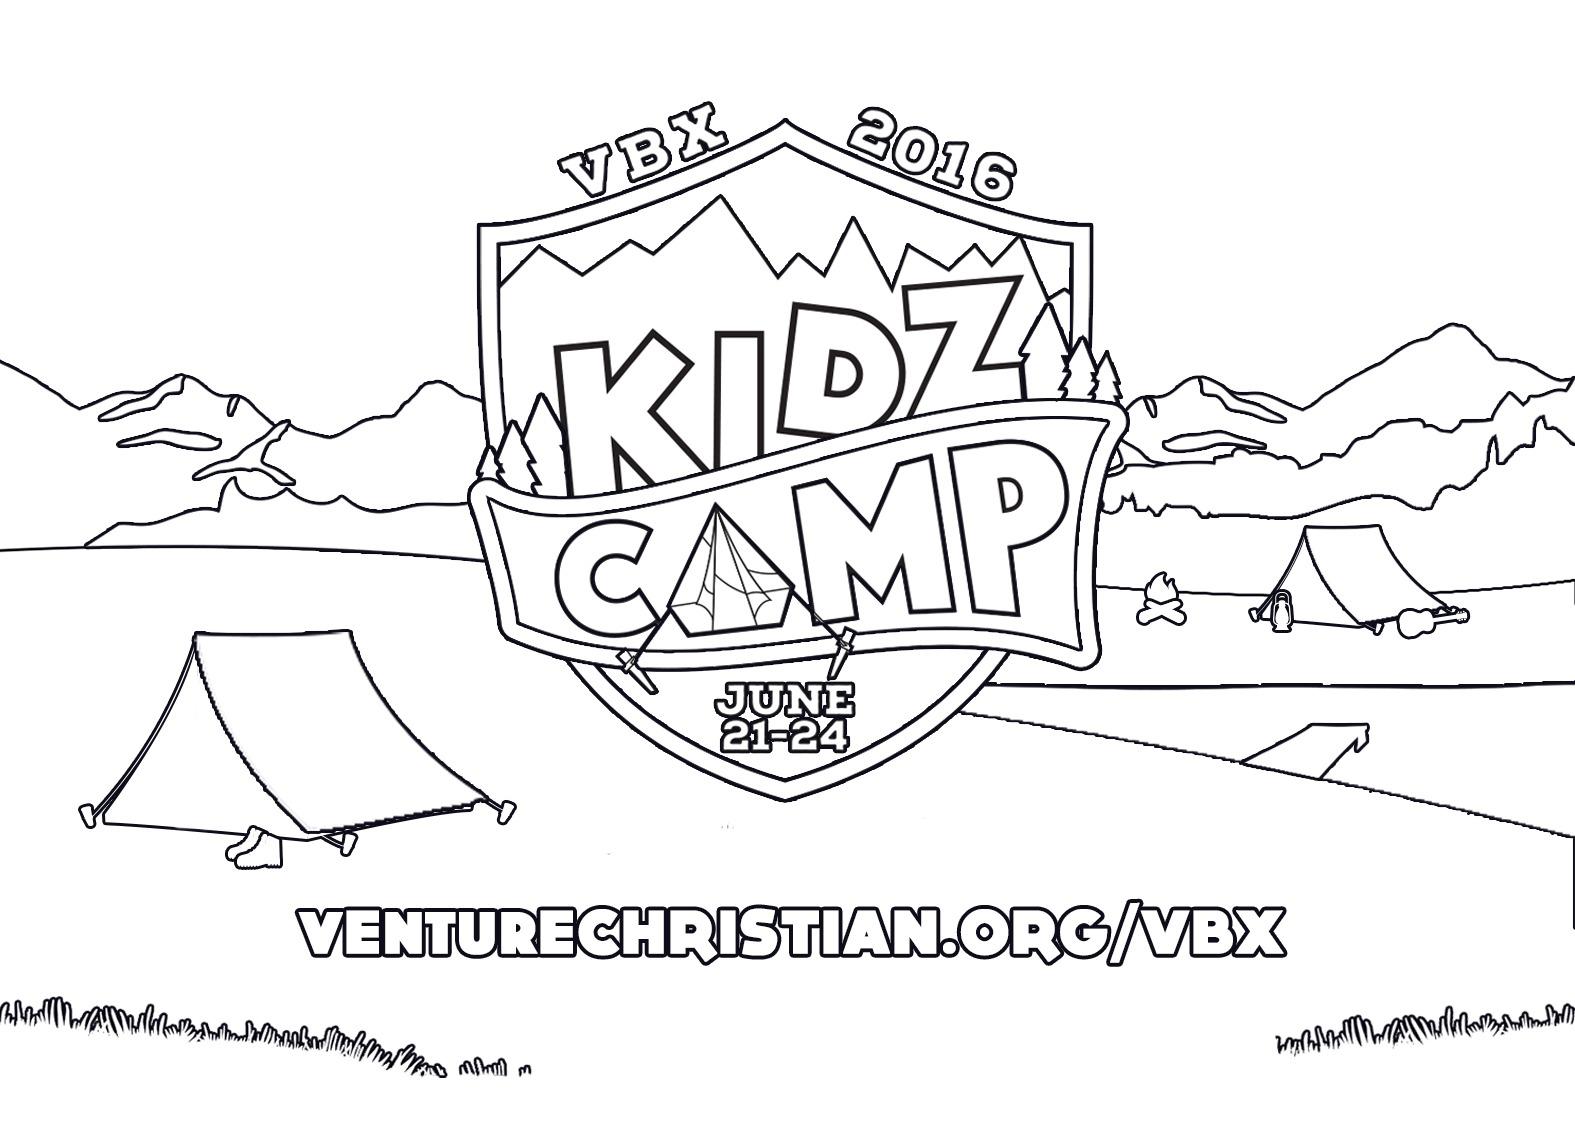 Venture Christian Kidz Camp Coloring Postcard